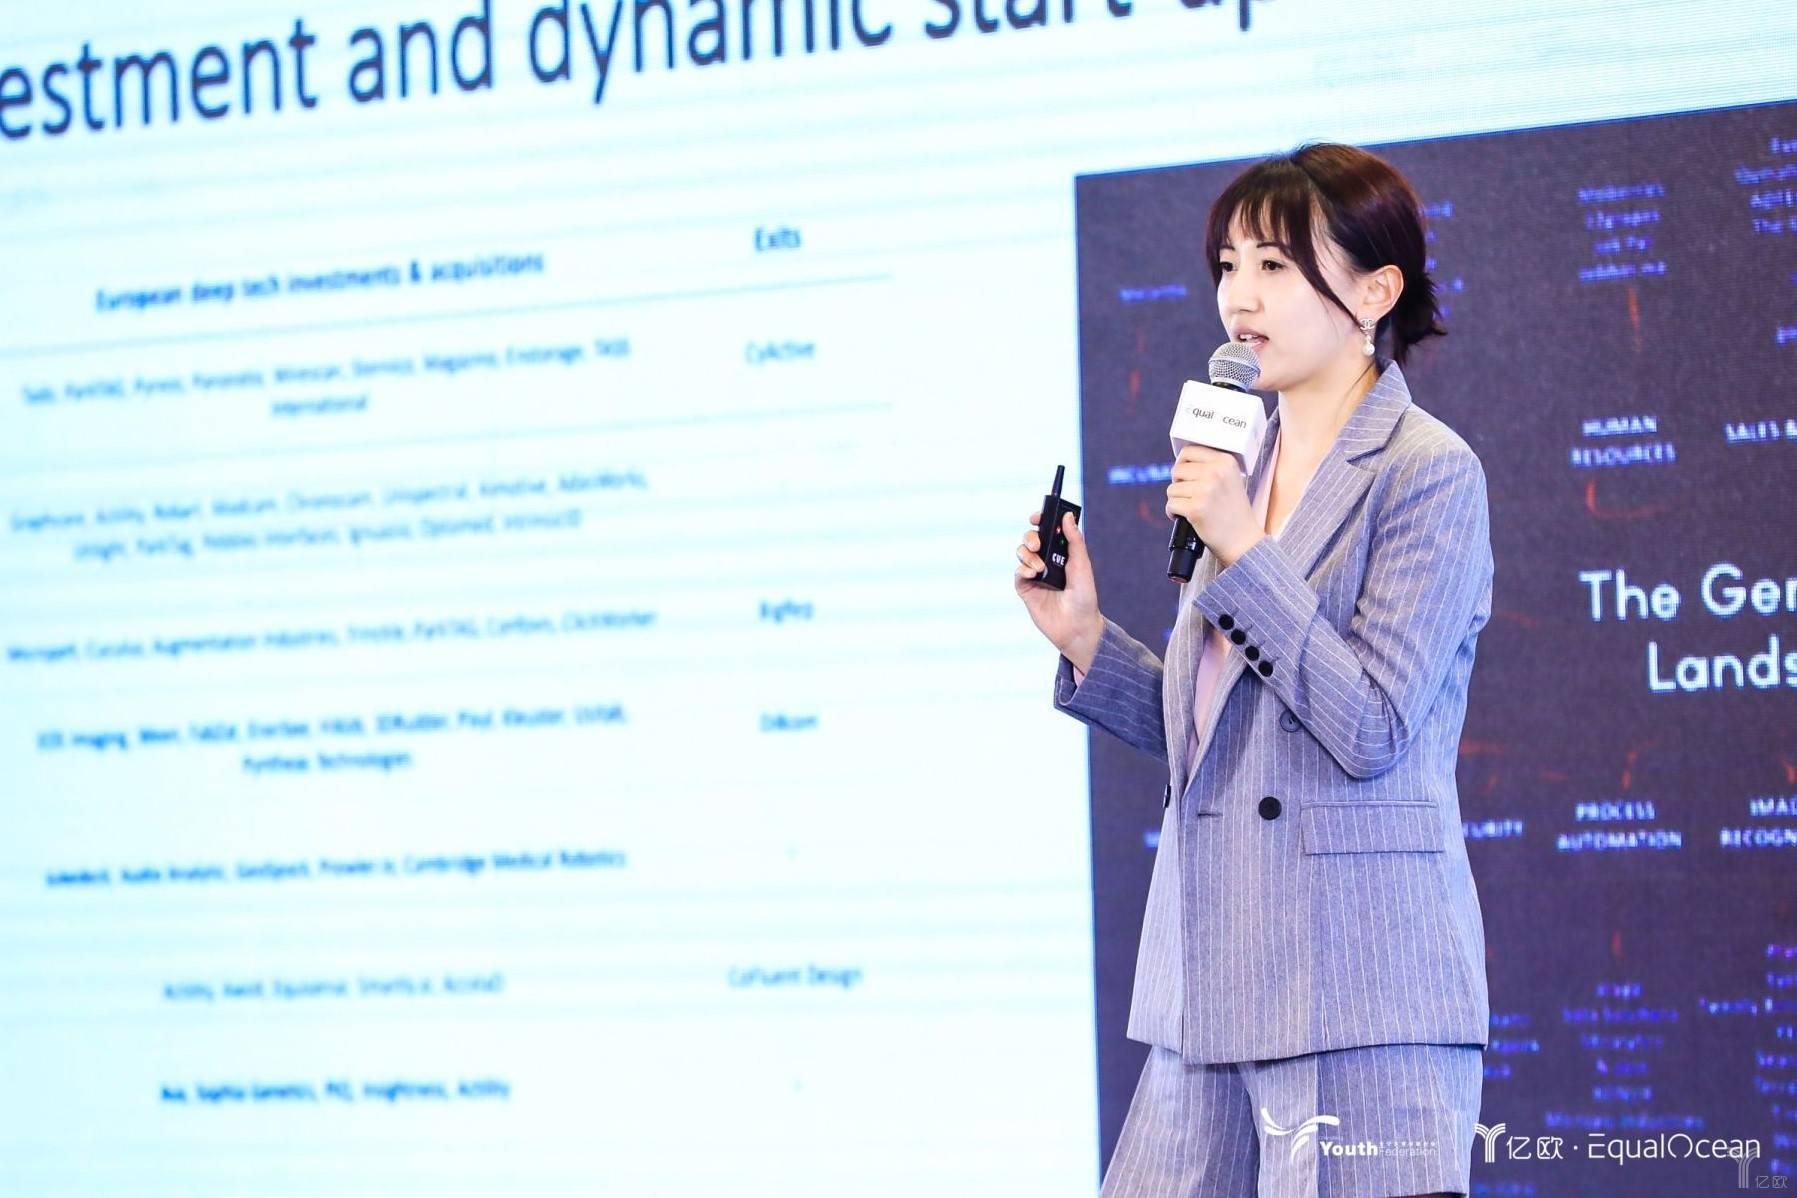 Axel Springer AG 亚太地区负责人Fiona Hui Hui演讲.jpg